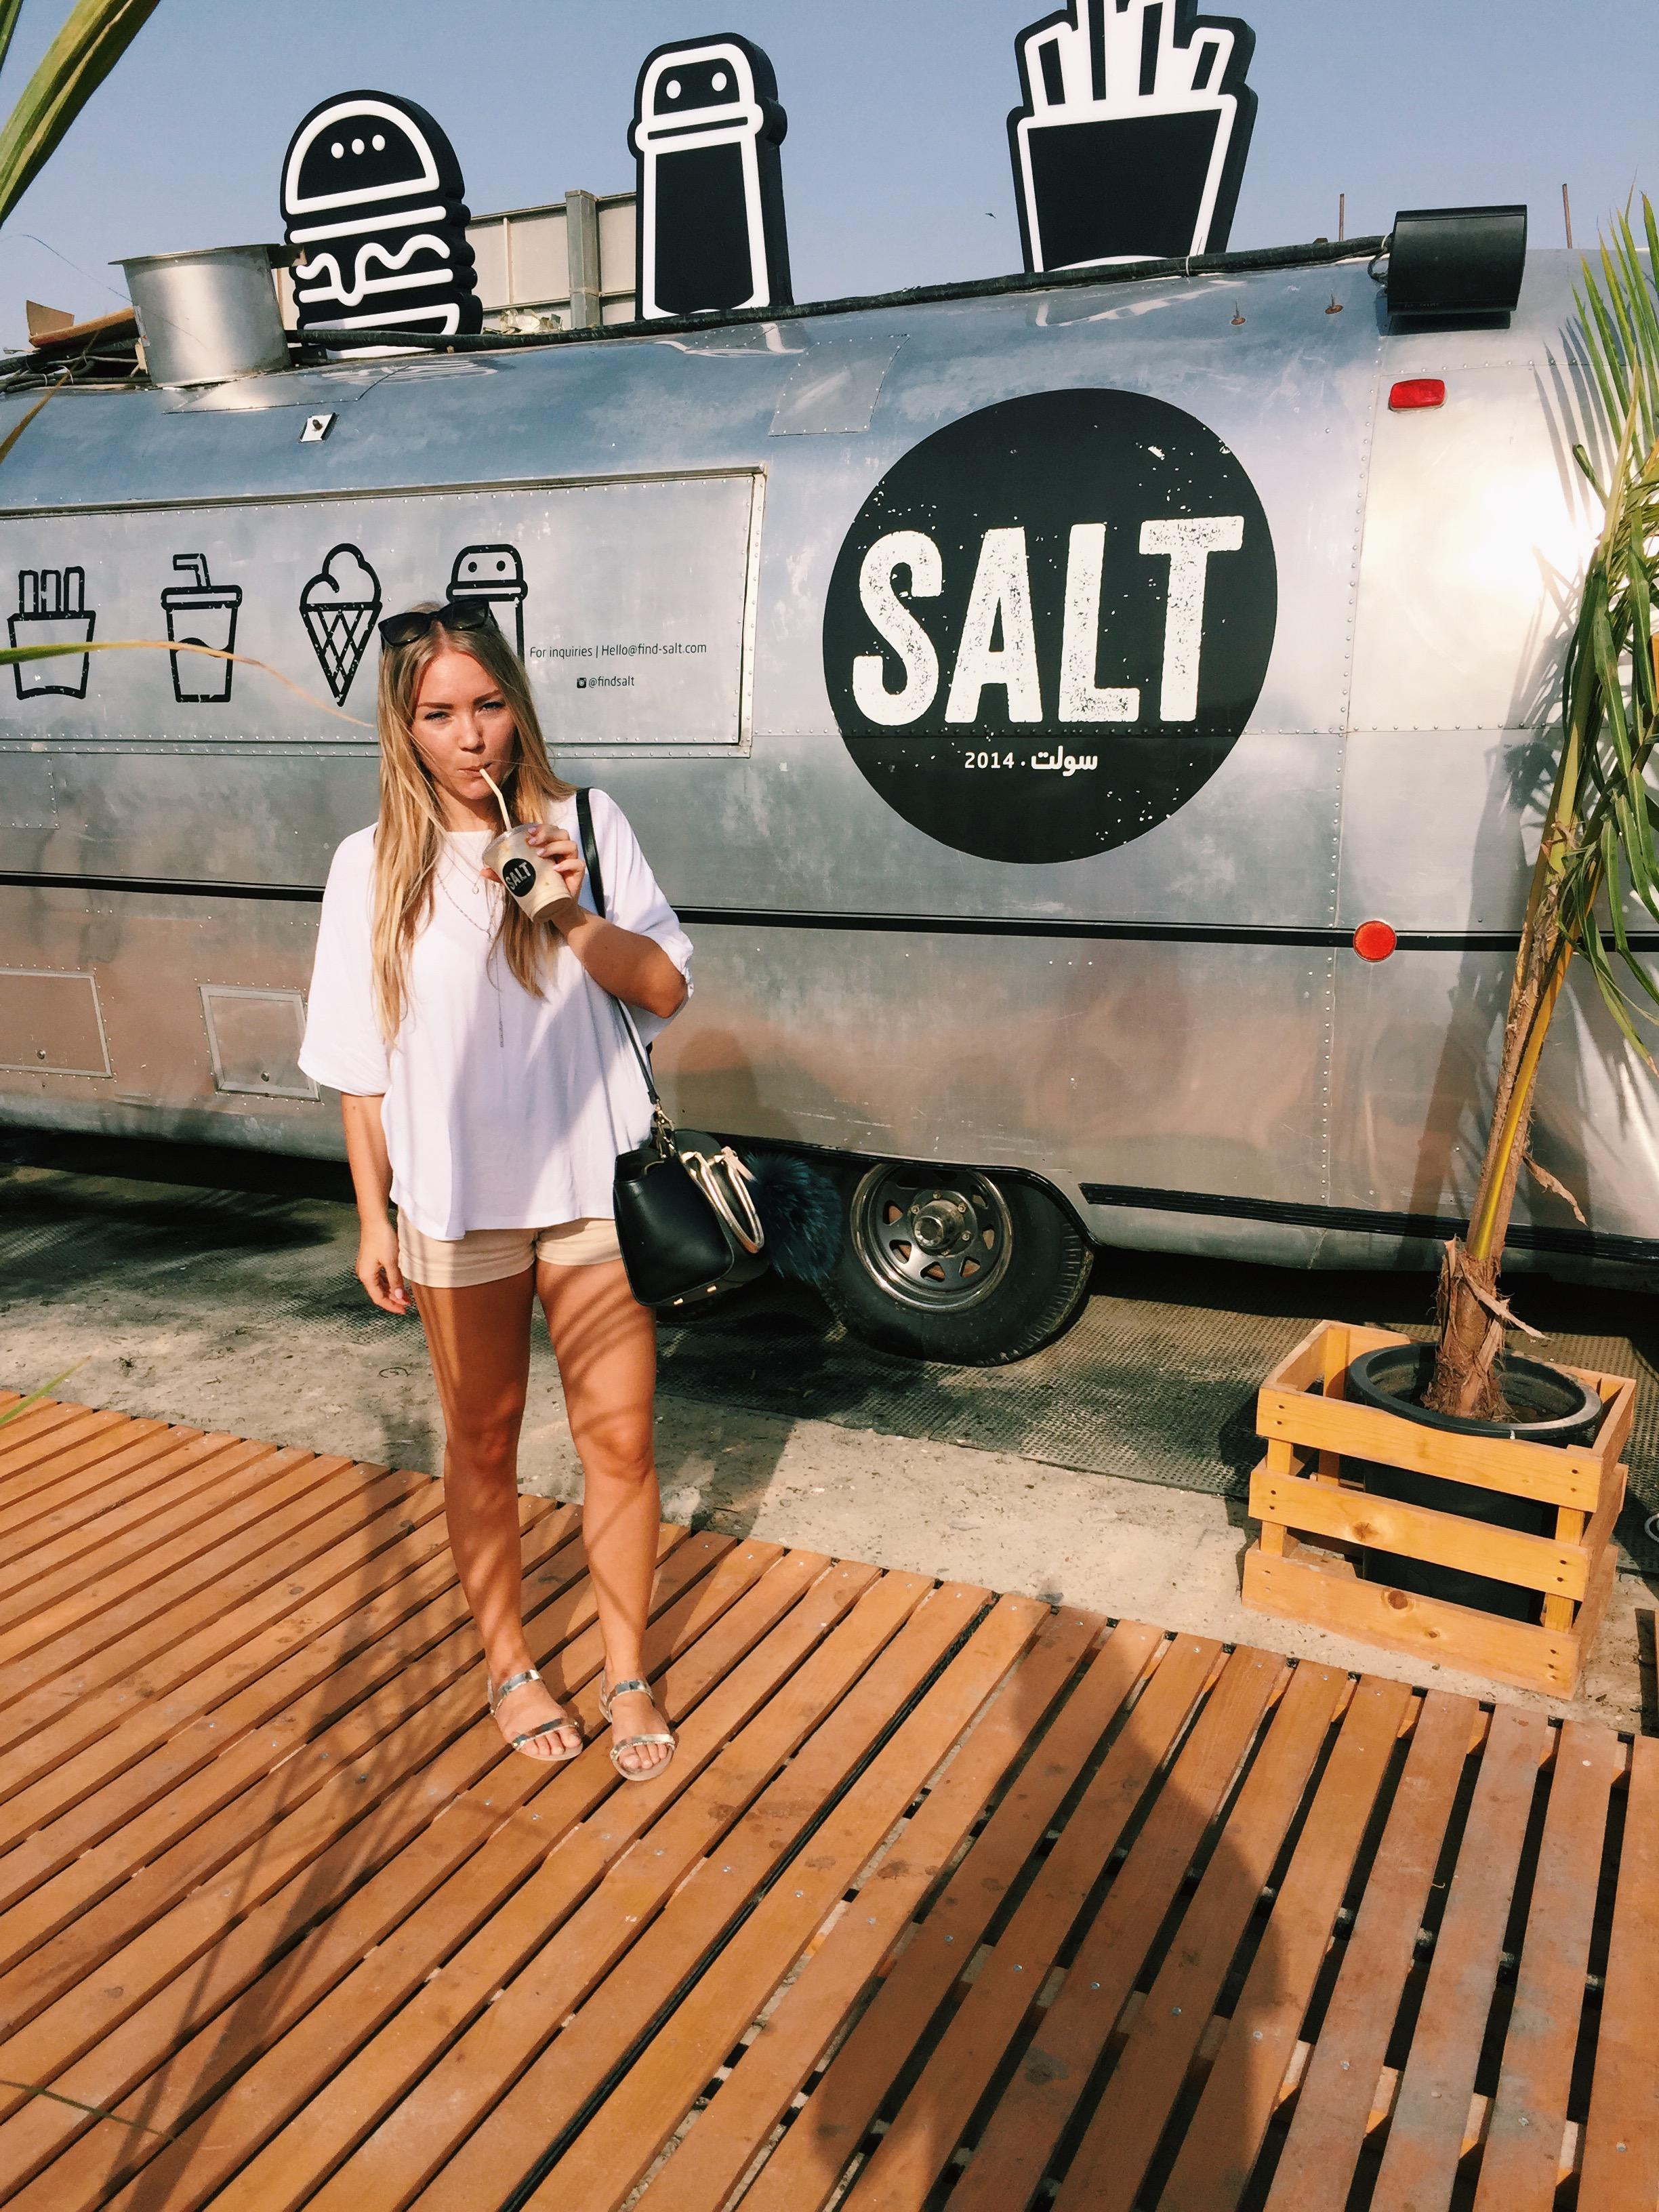 how to find salt in subnautica